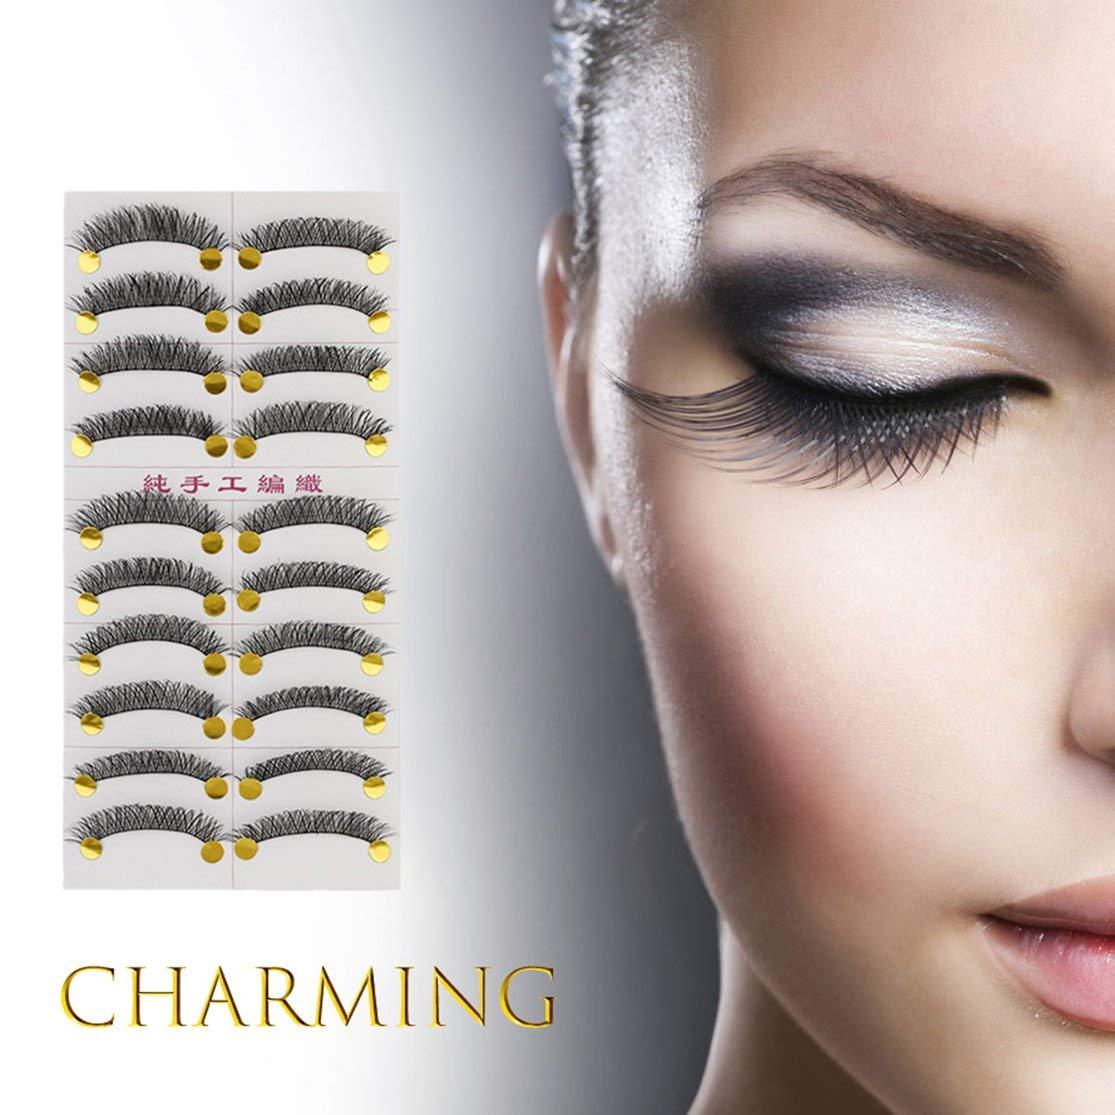 LouiseEvel215 M14 Handmade False Eyelash Janpanese Style Pure Manual Long Thick Messy 10 Pairs Popular Beauty Tool for Women Makeup